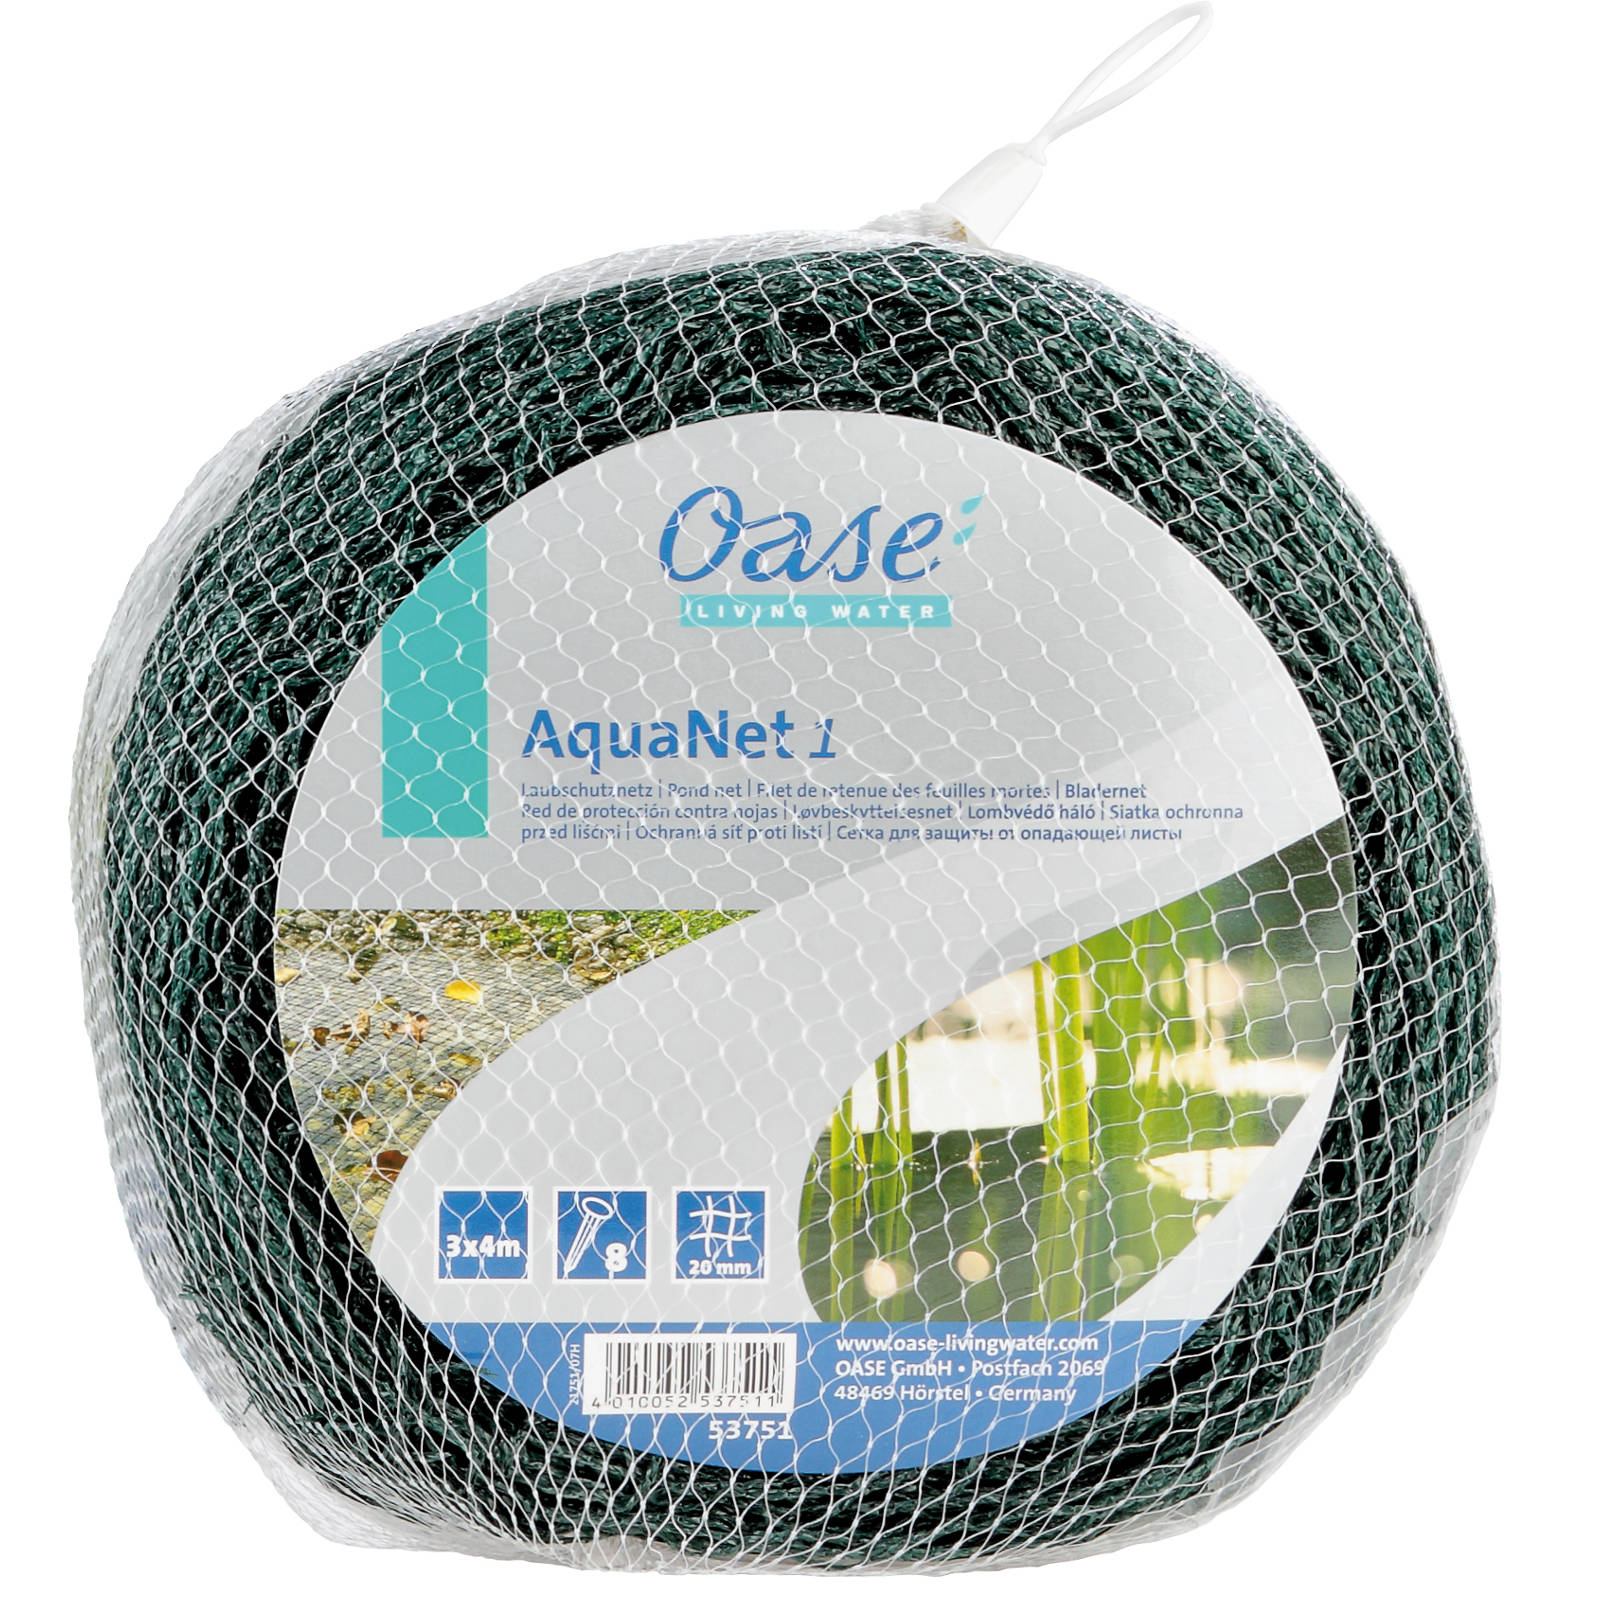 Oase AquaNet Teichnetz 1 / 3 x 4 m